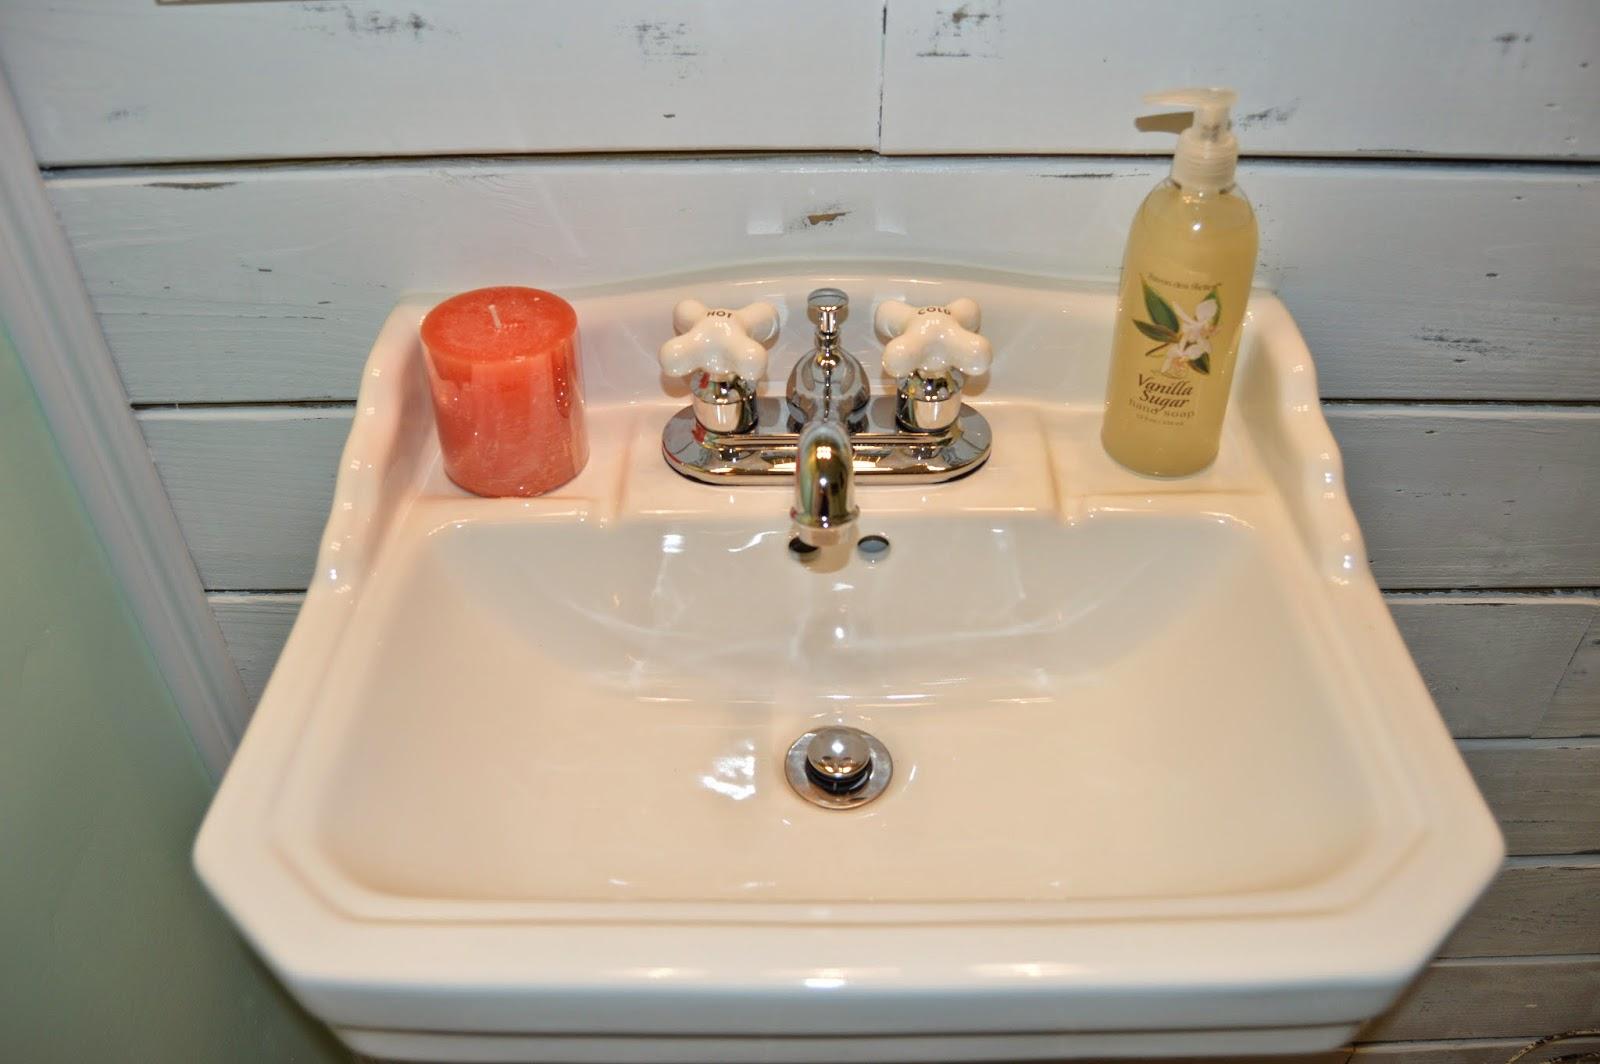 New Pedestal Sink Home Depot faucet Amazon Tile Lowe us